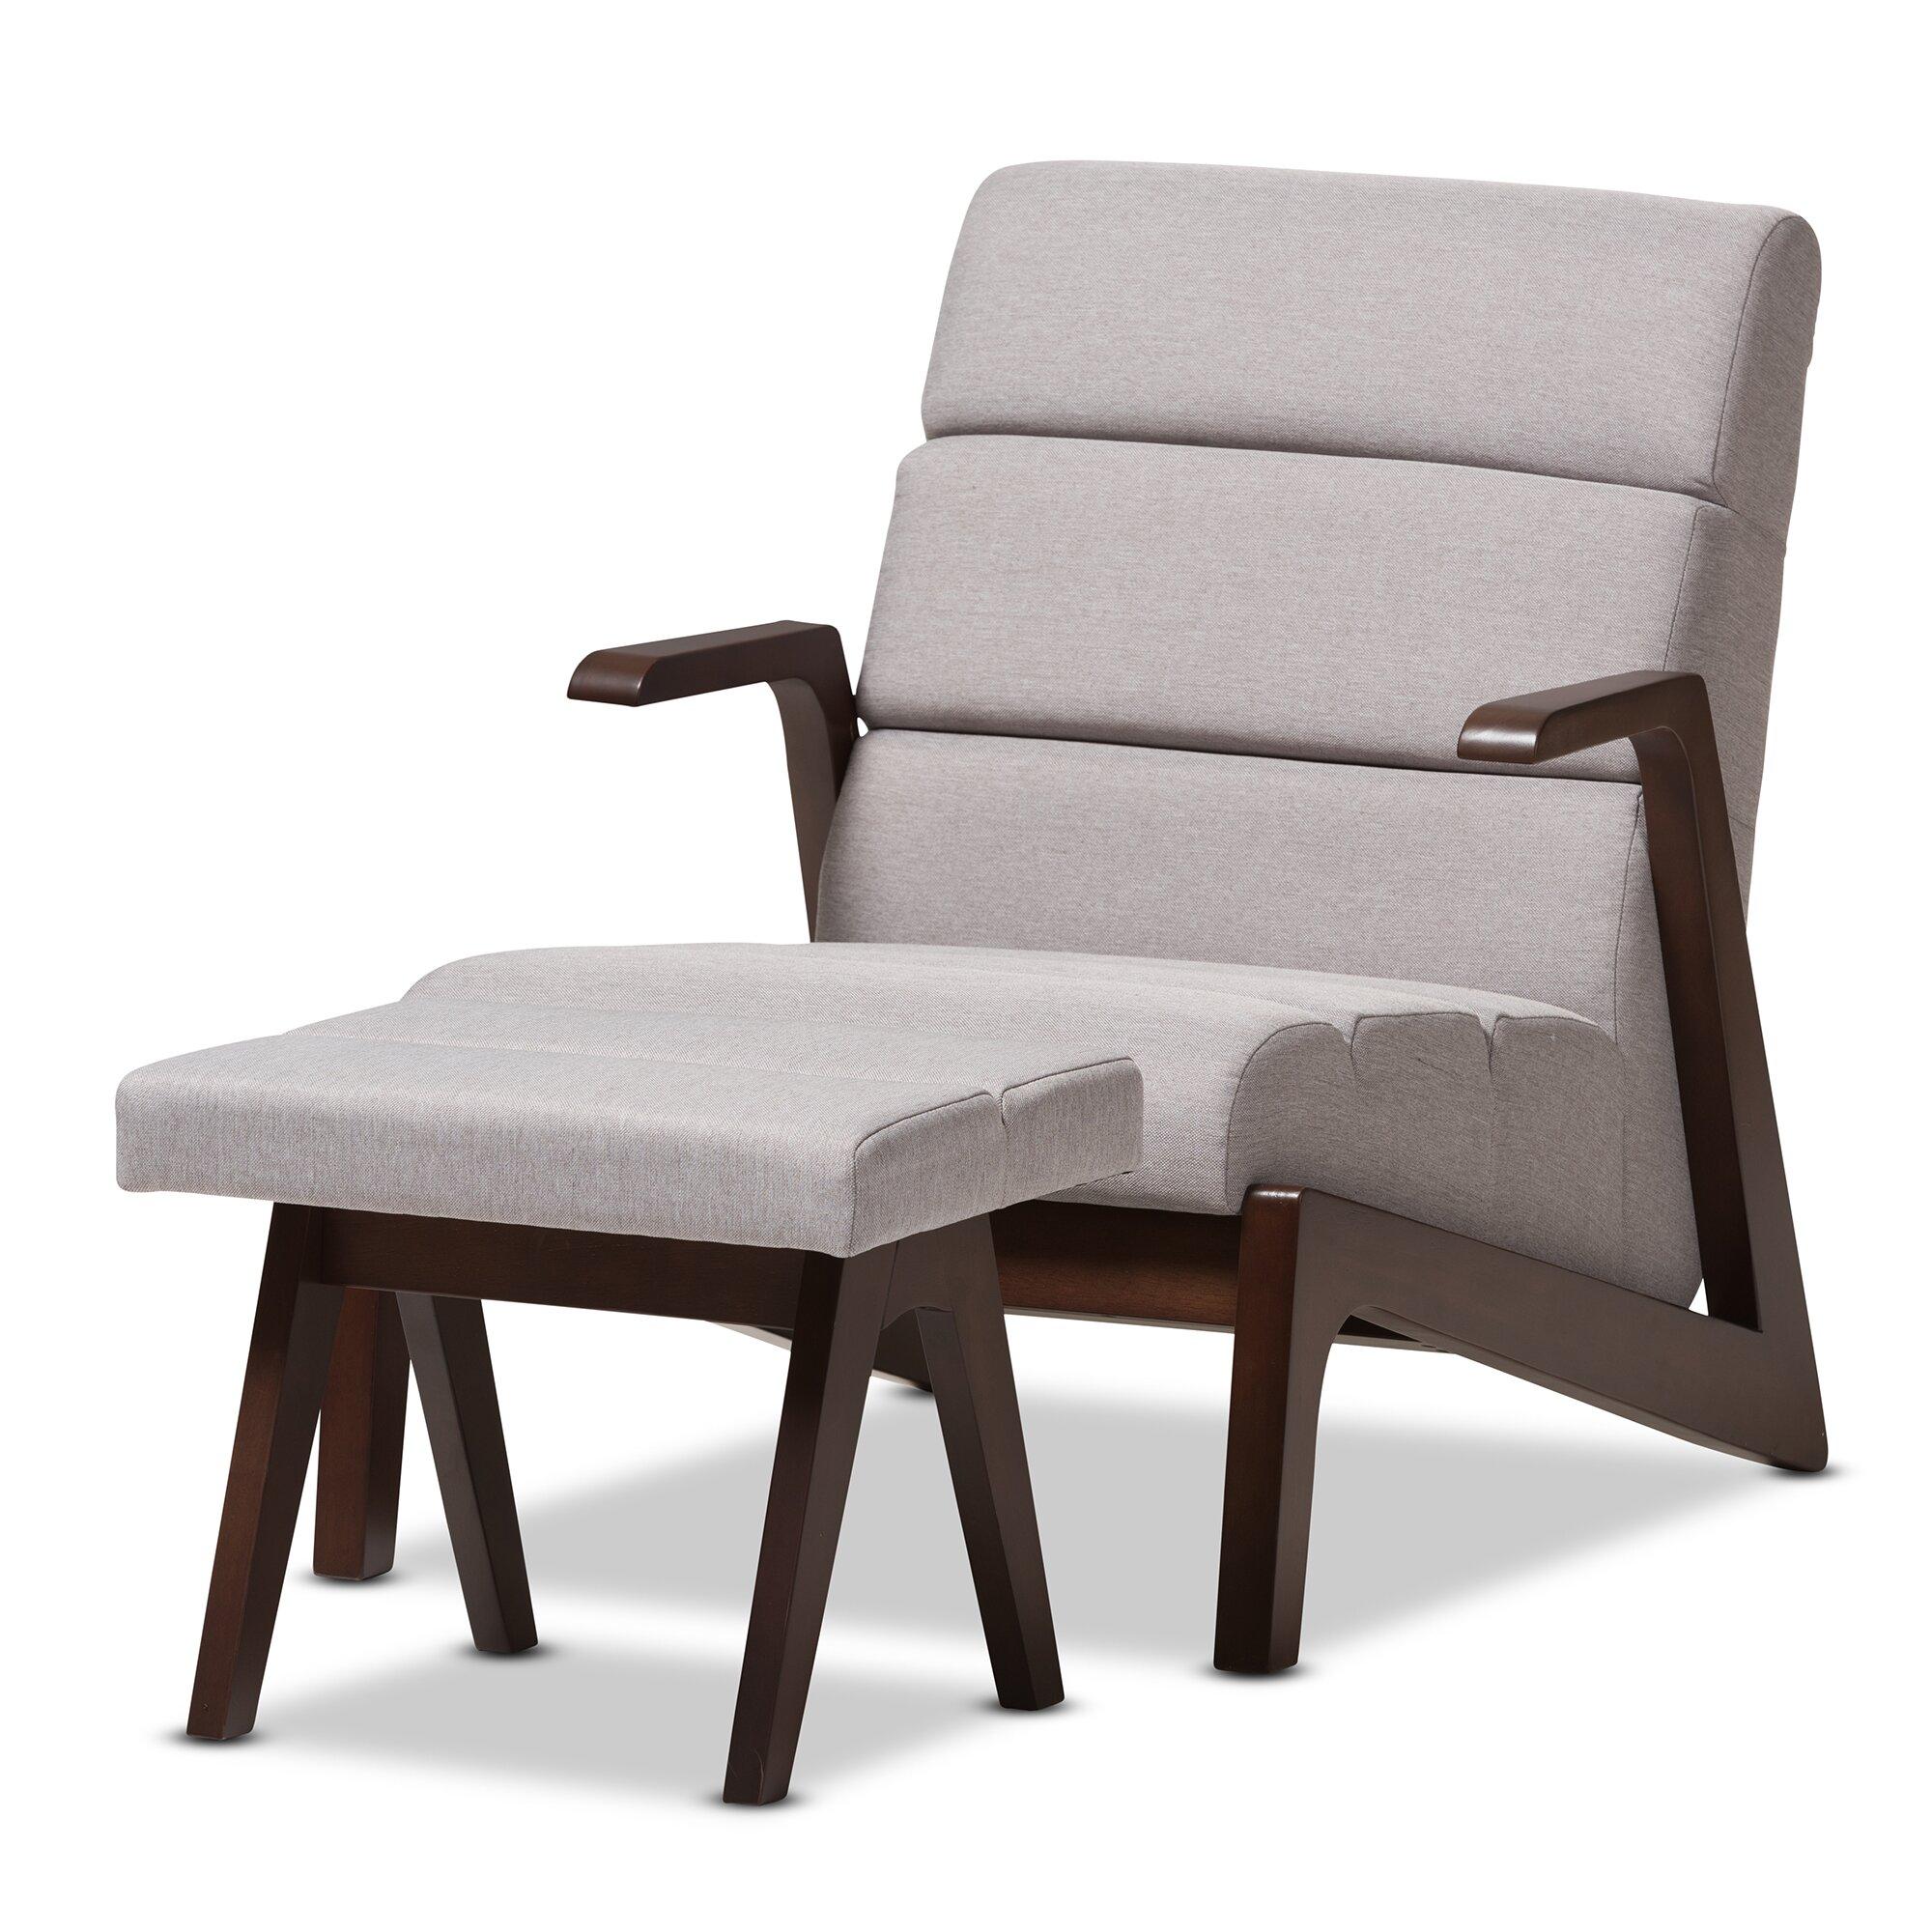 Wholesale interiors lazzaro mid century modern lounge chair and ottoman reviews wayfair - Mid century modern chair and ottoman ...